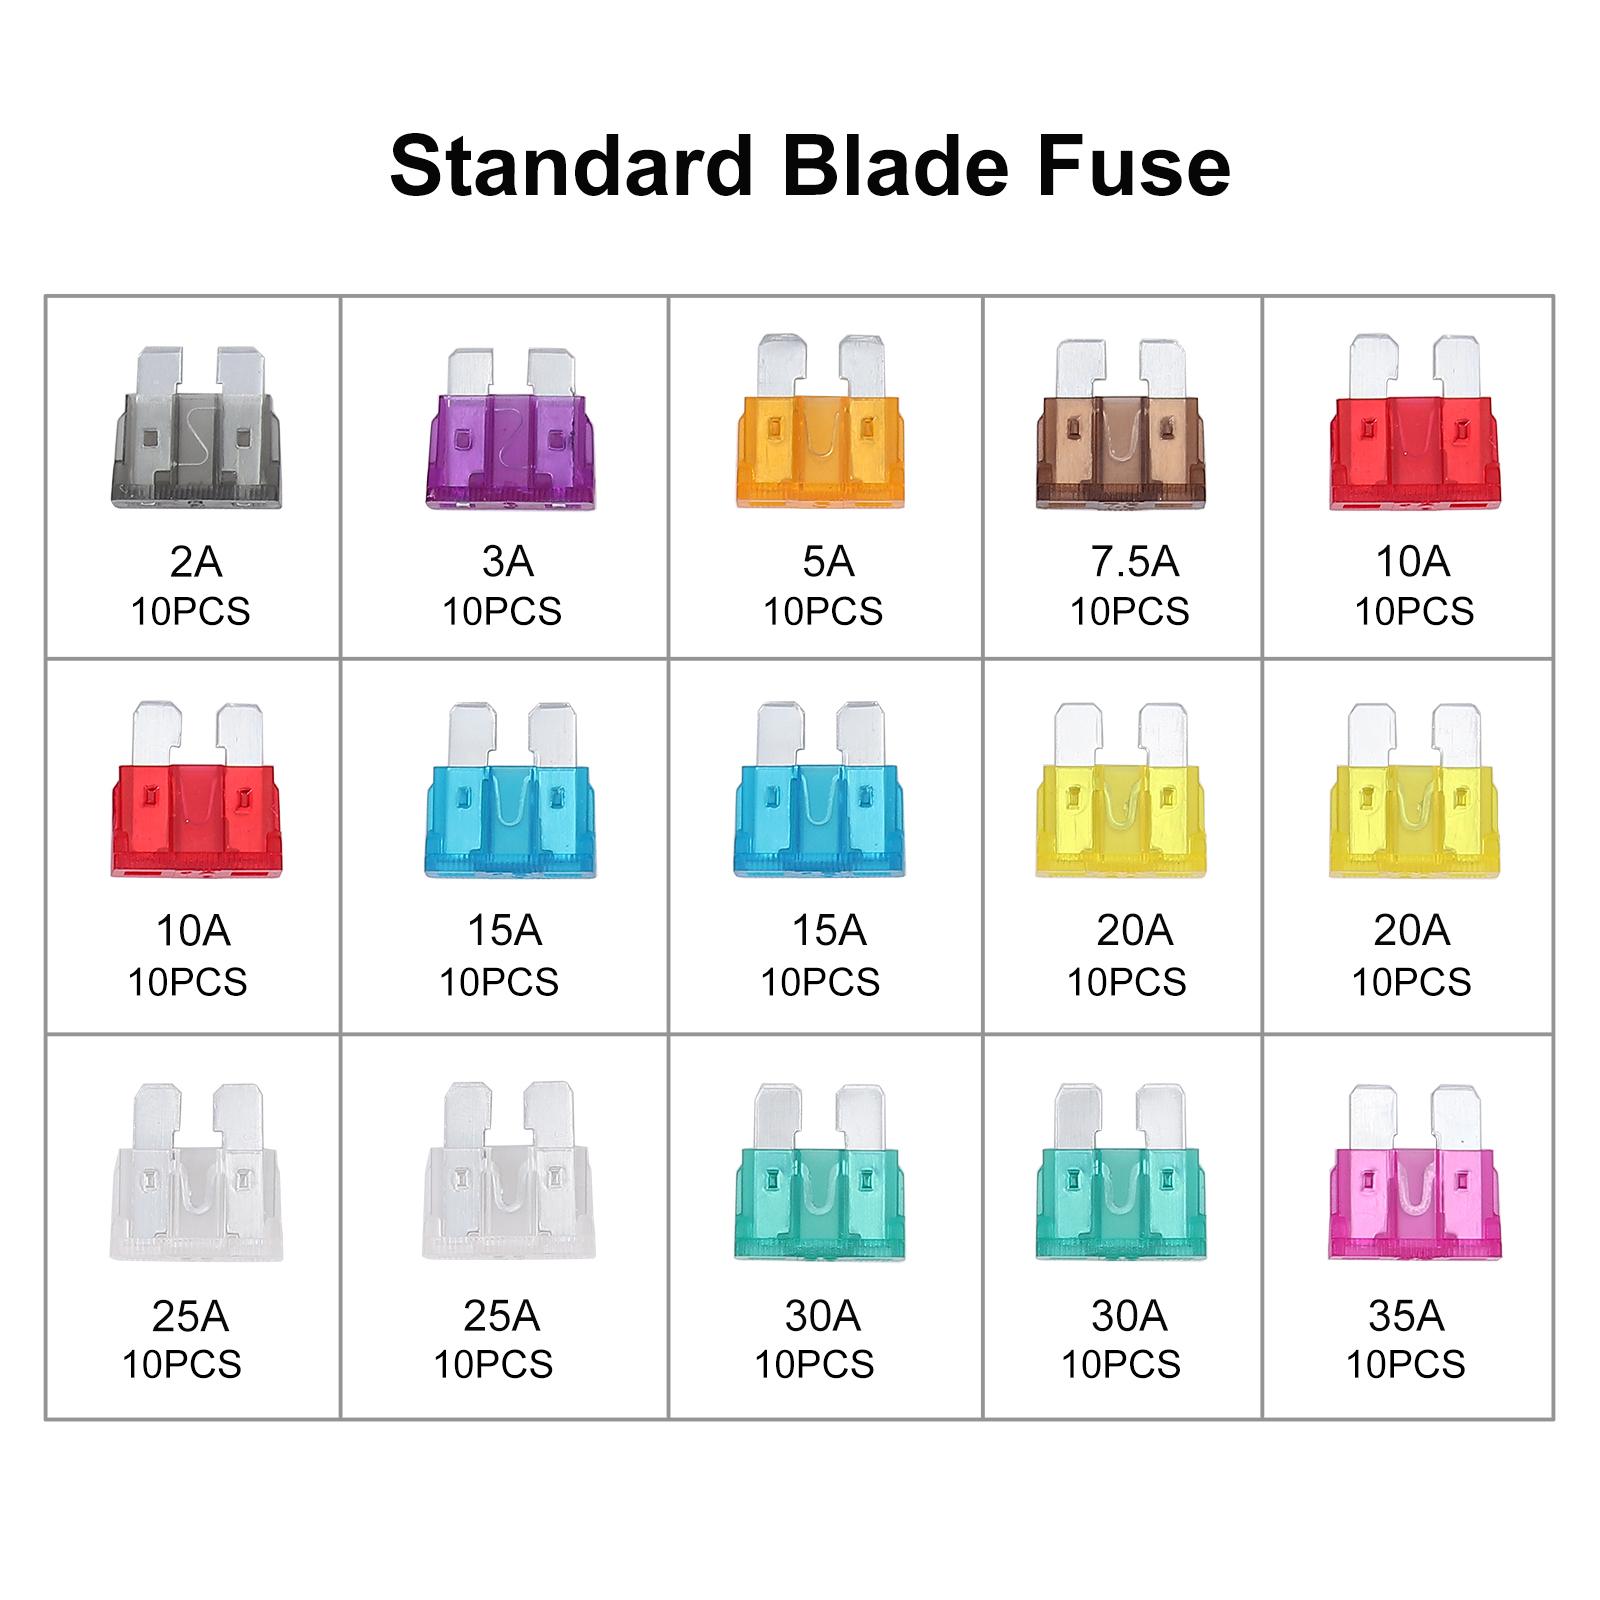 150x Auto Car Assorted Fuse Standard Blade Fuses Assortment Kits 2a